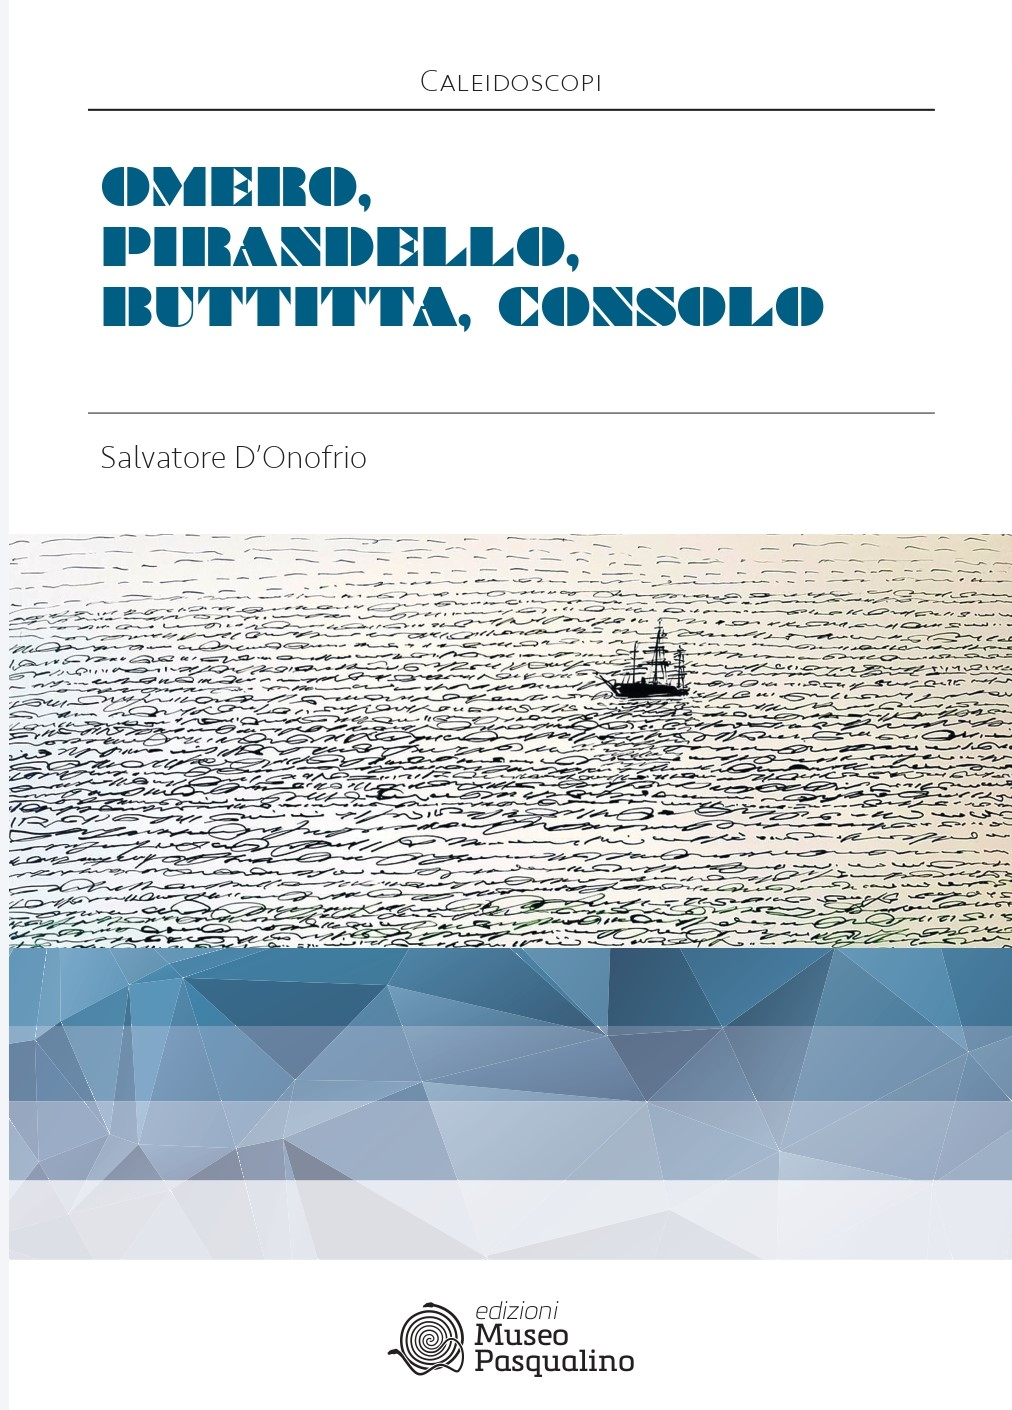 copertina_donofrio_caleidoscopi_pages-to-jpg-0001.jpg - 344.13 kB